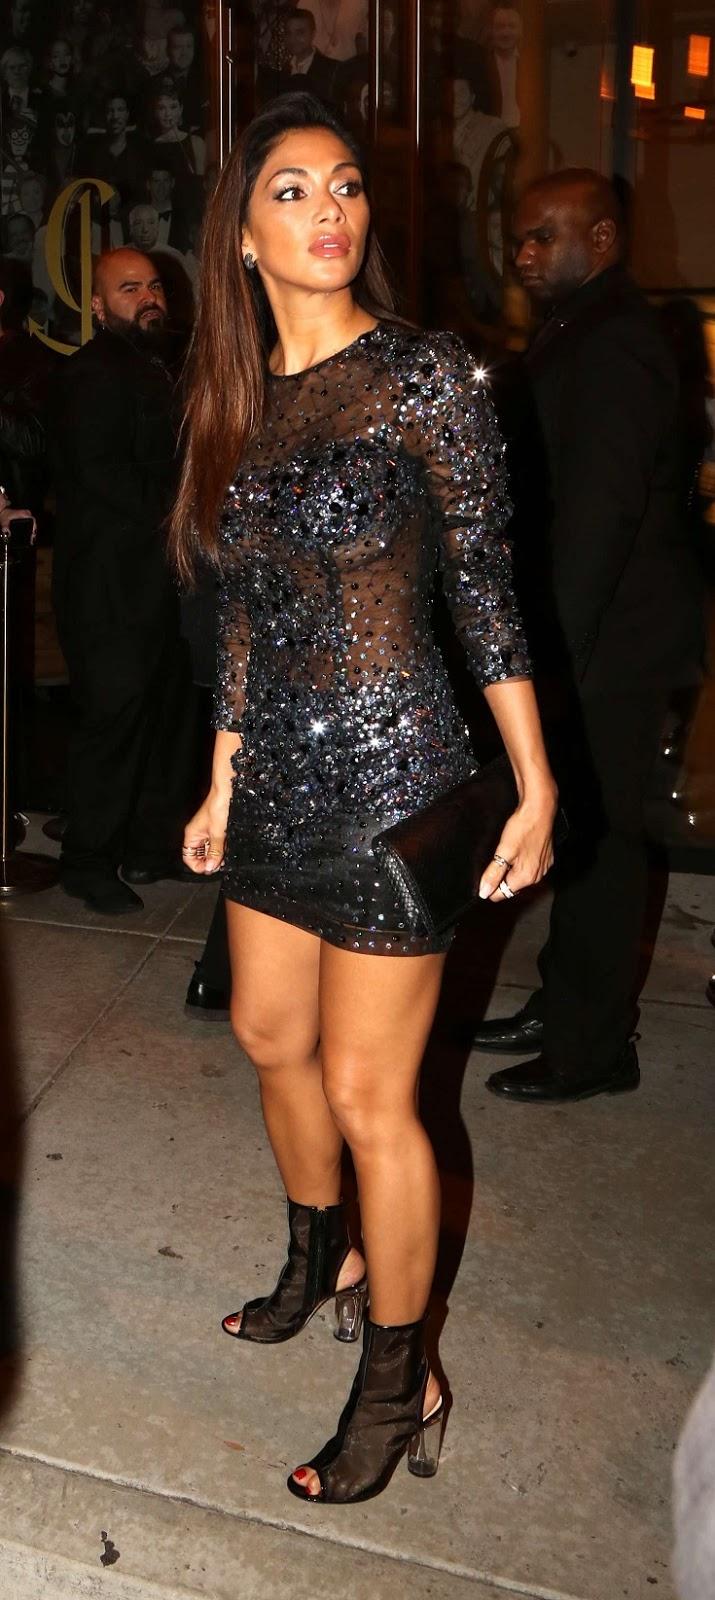 Nicole Scherzinger bares sideboob in embellished mini dress at Grammys After Party